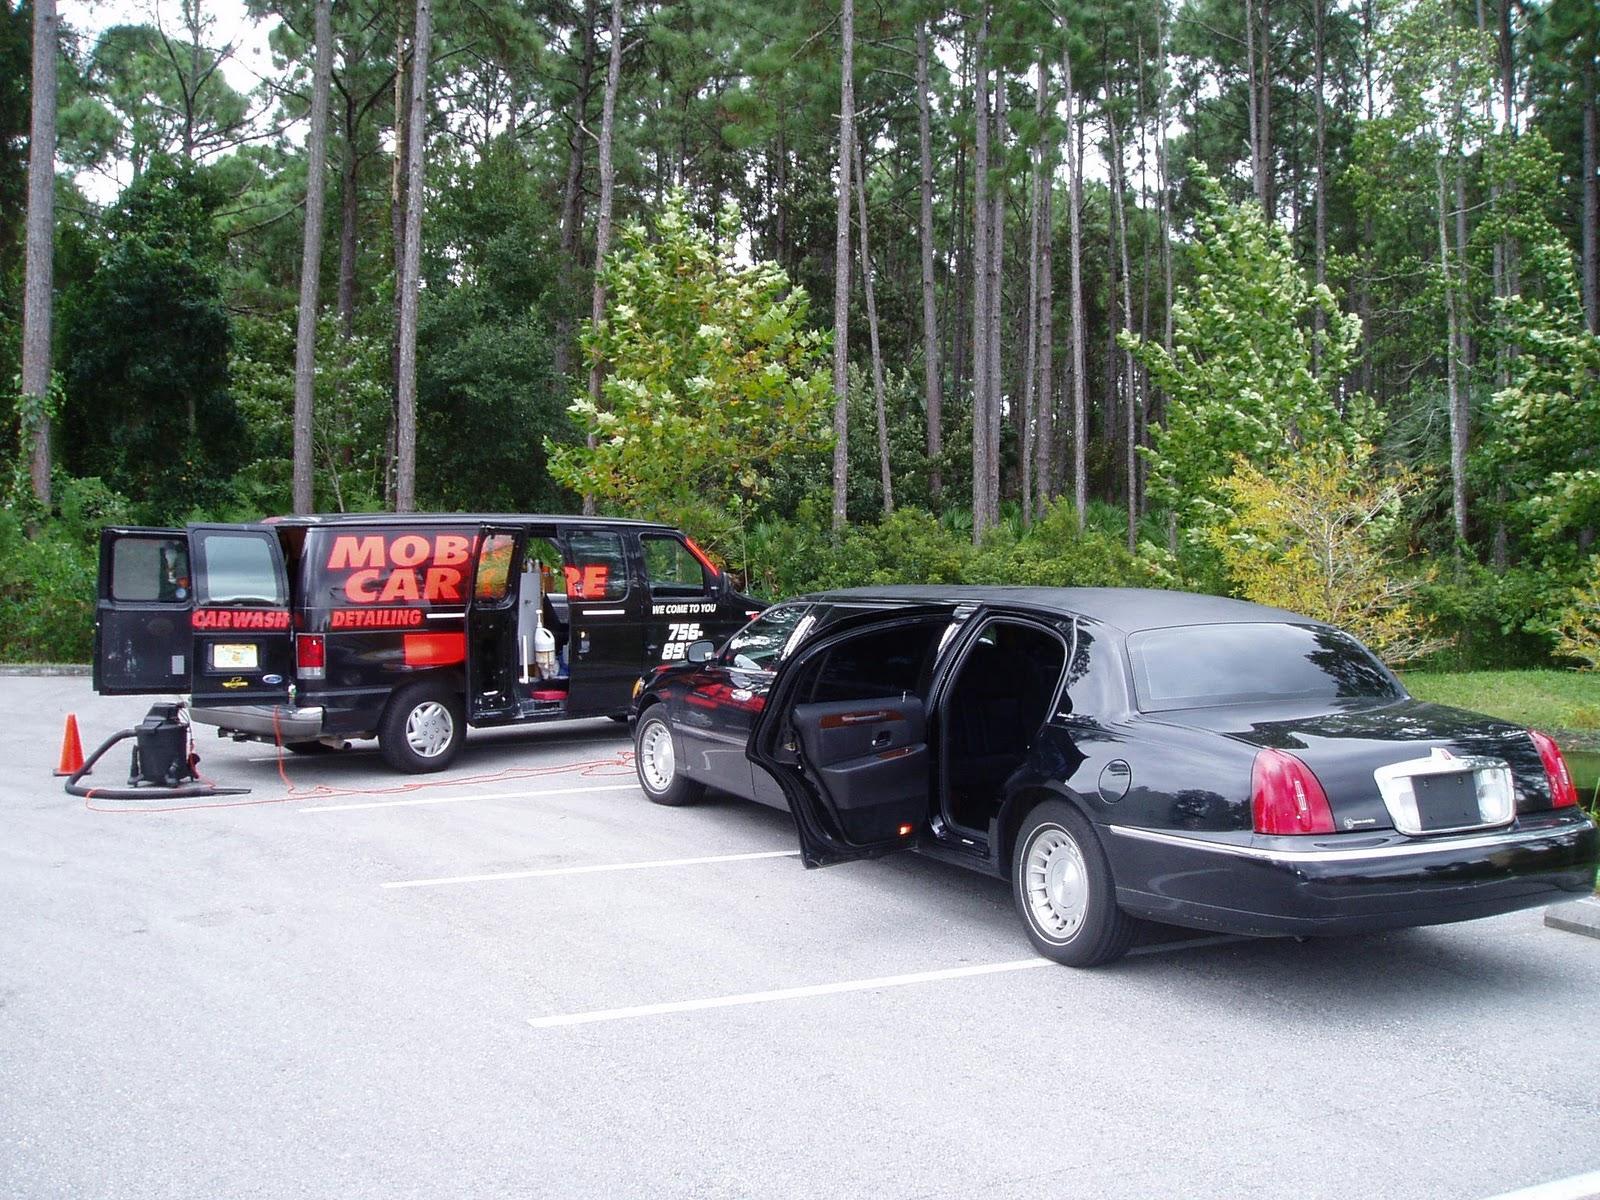 Mobile Car Wash New Tampa